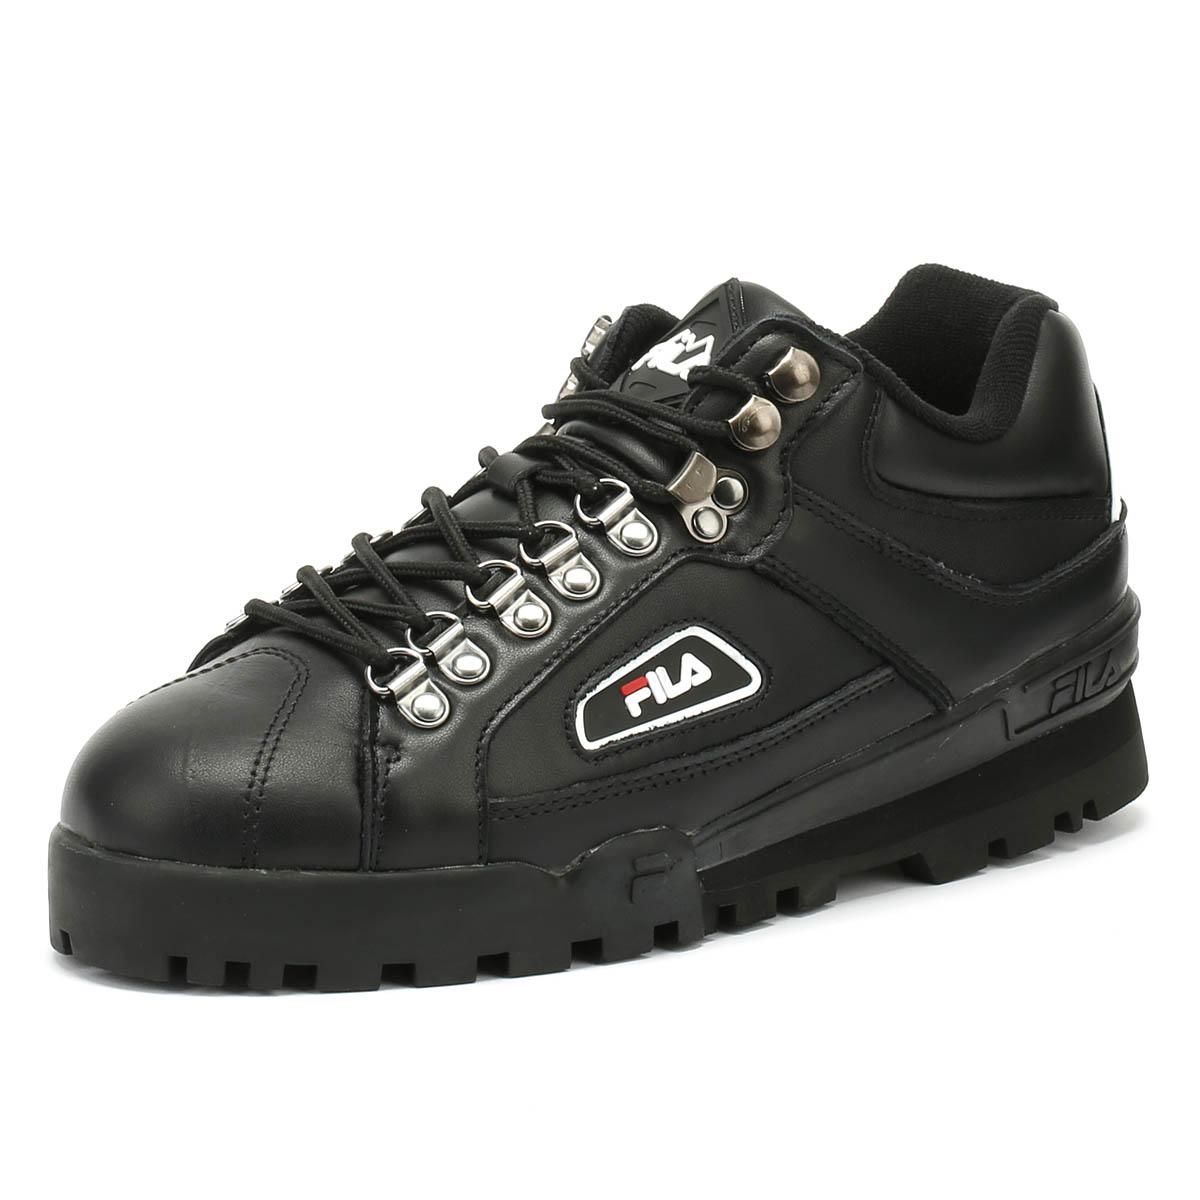 14726bf515d9 Details about Fila Unisex Trainers Black Trailblazer Lace Up Casual Sport  Shoes